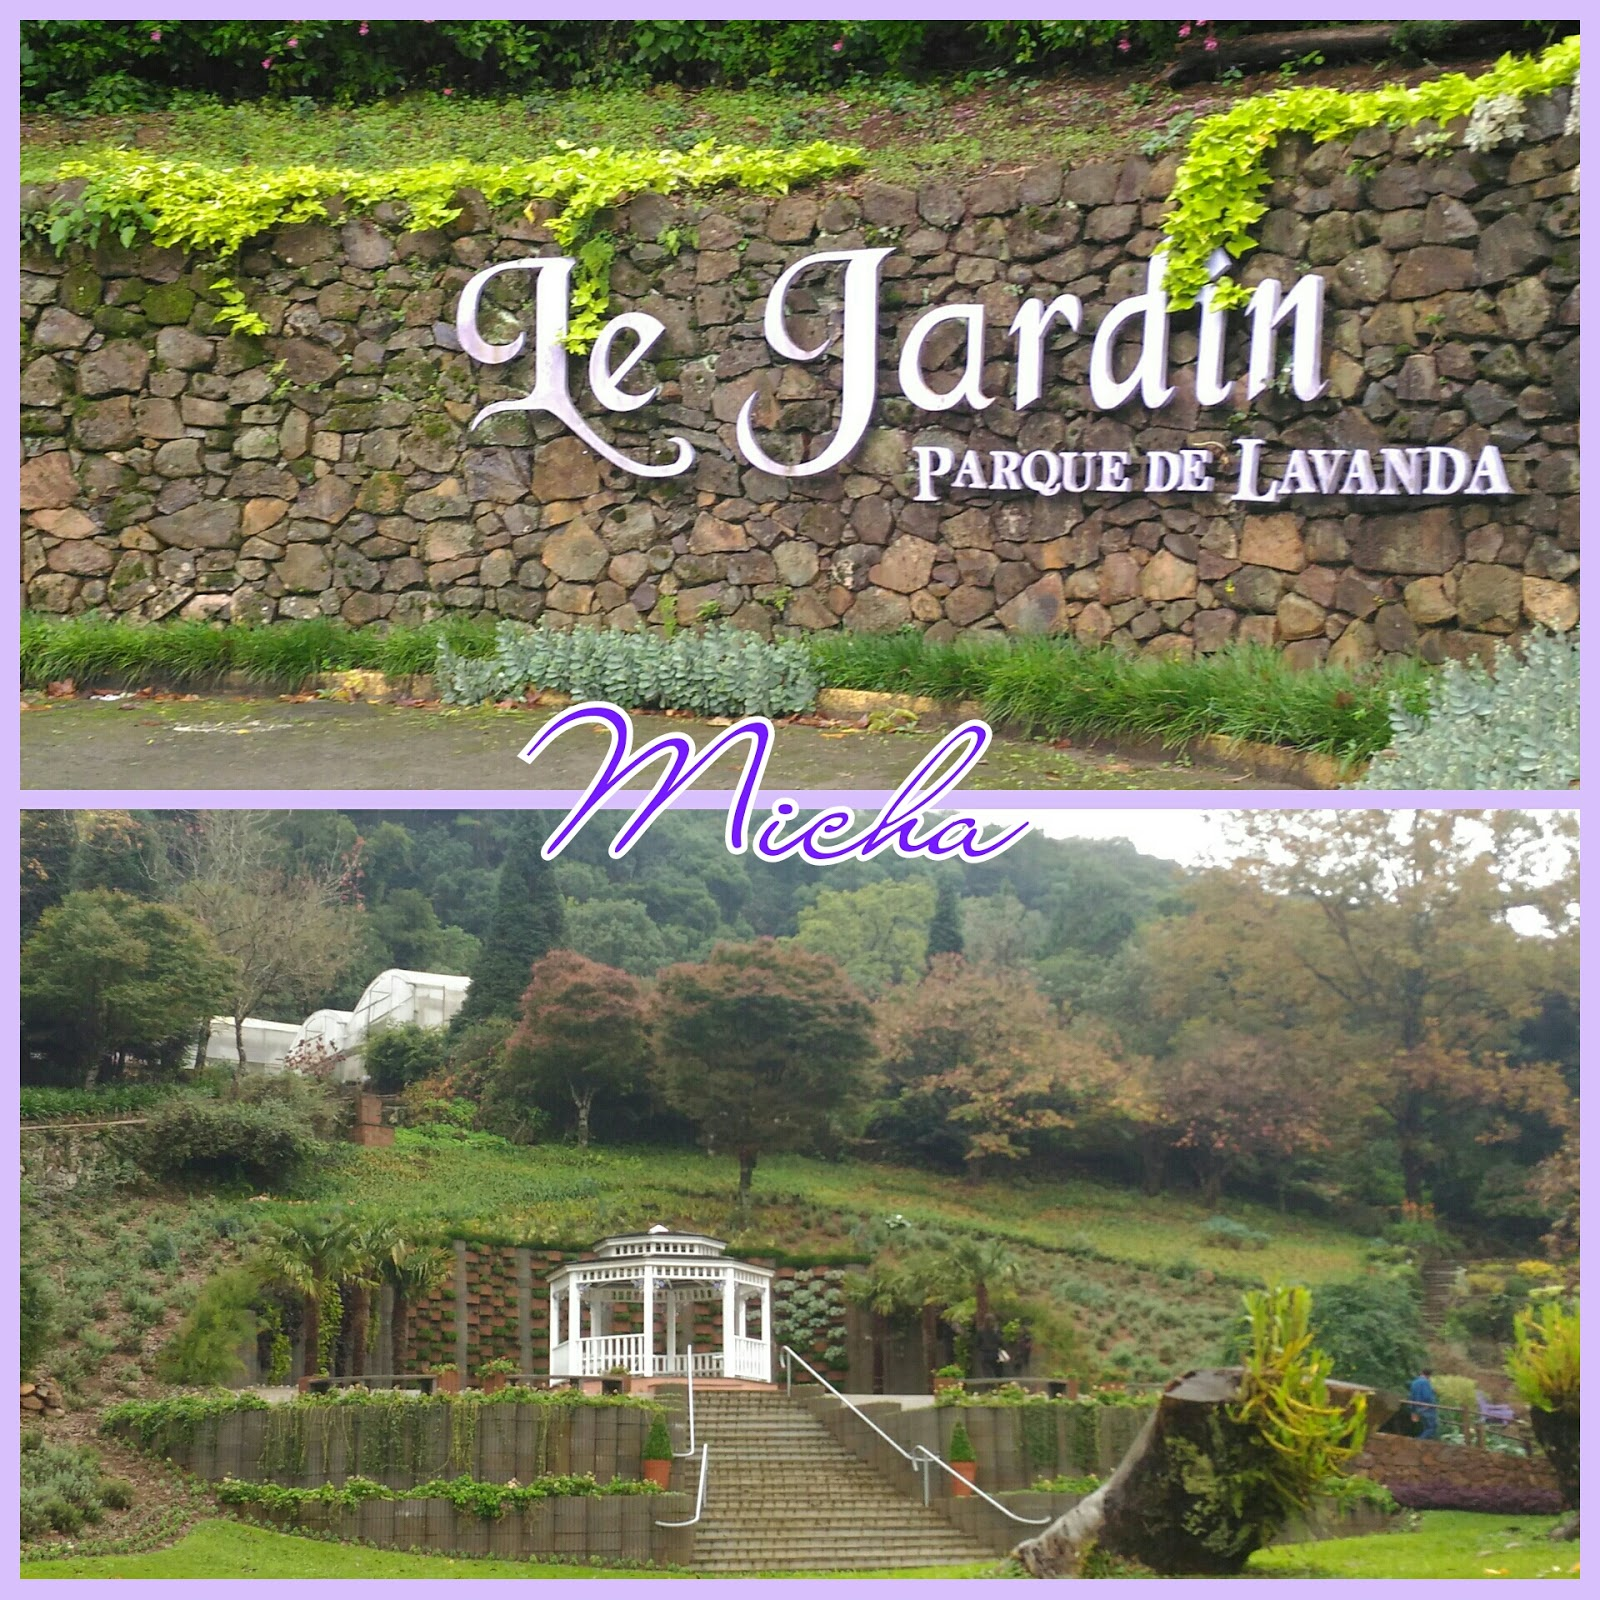 Carpe diem dia 5 parte 2 le parque jardin lavanda for Jardines de lavanda